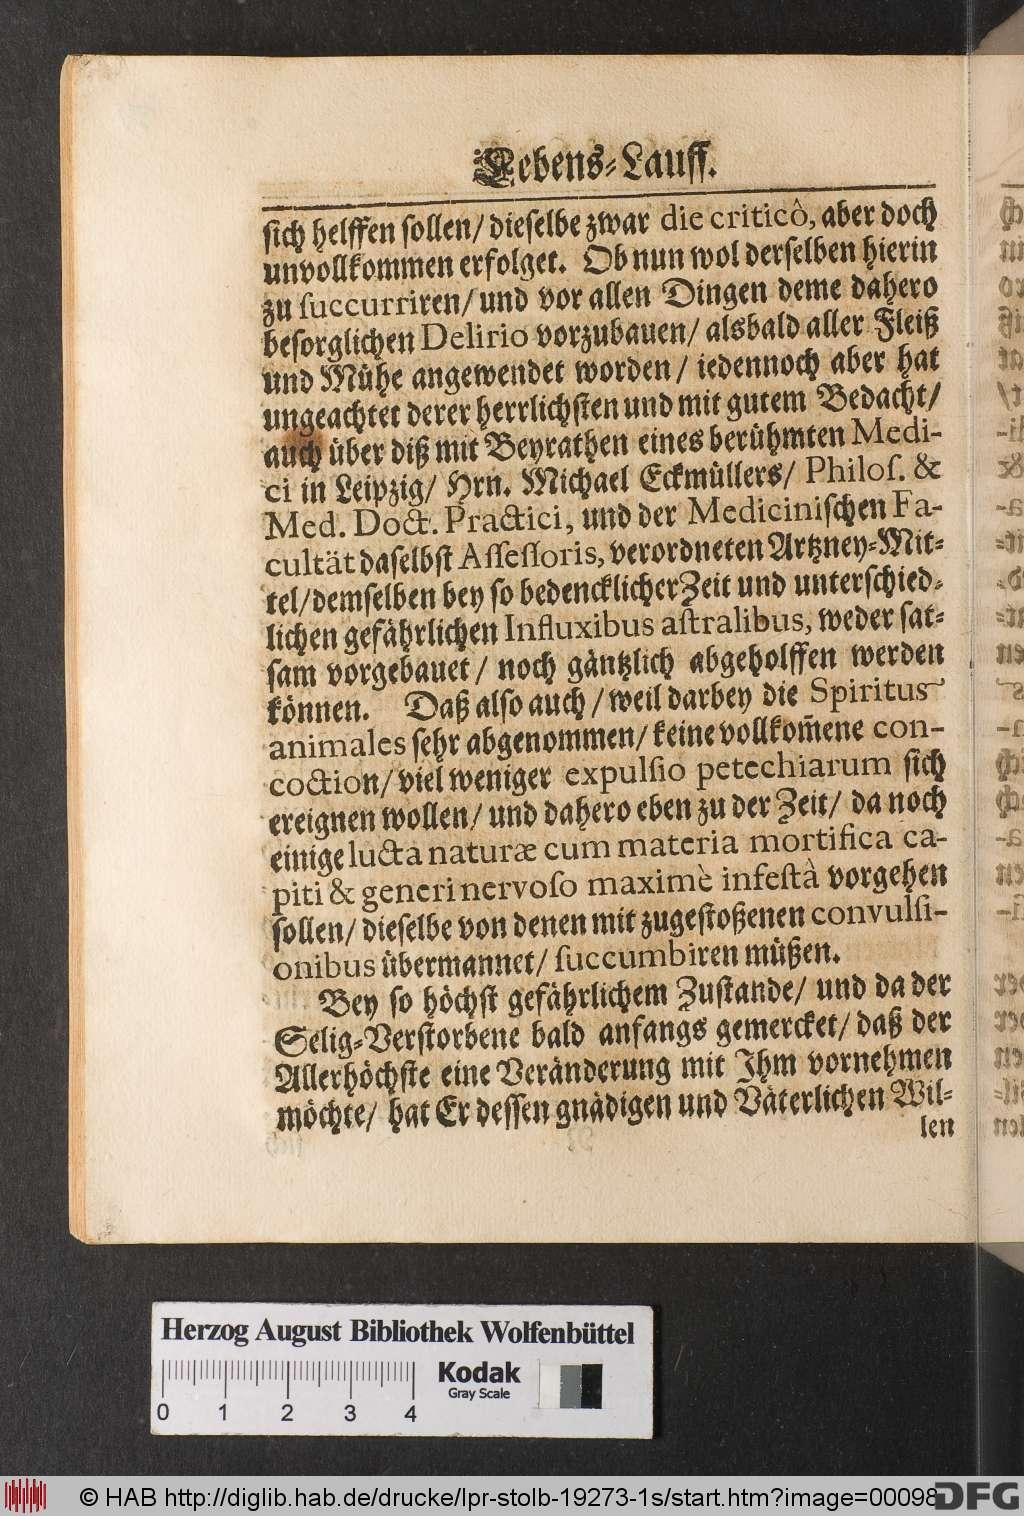 http://diglib.hab.de/drucke/lpr-stolb-19273-1s/00098.jpg